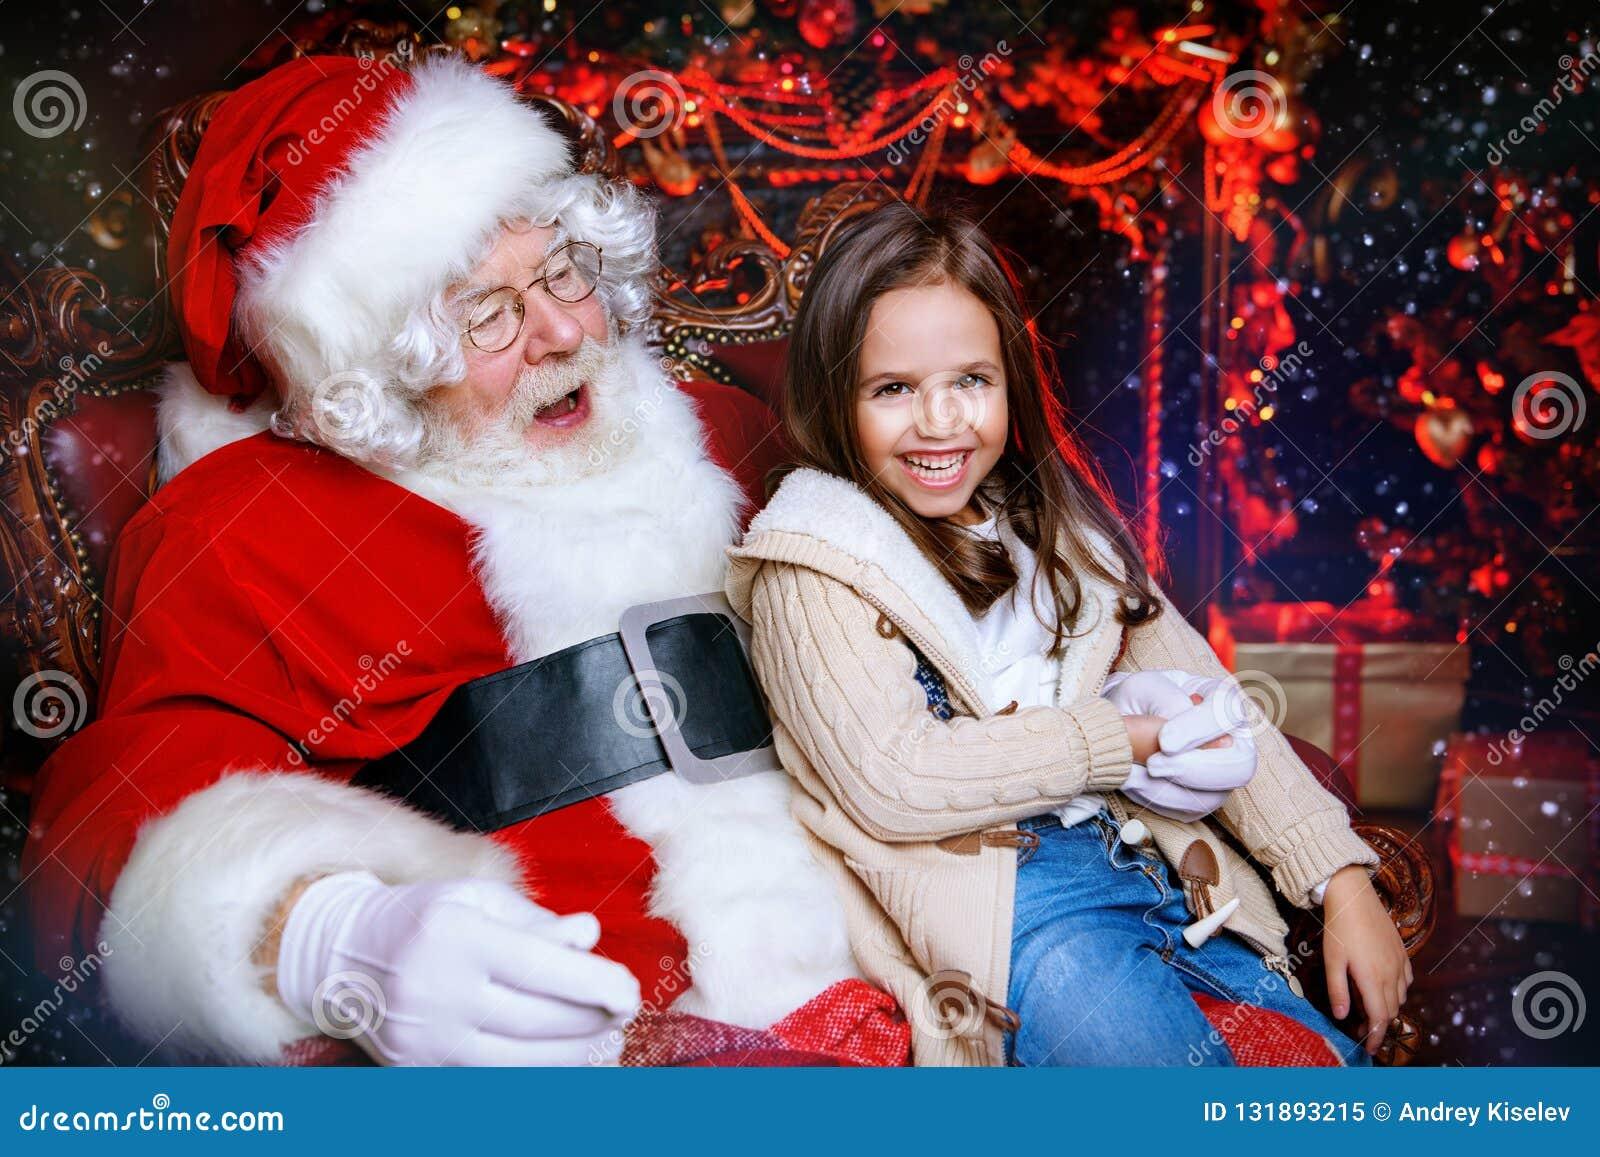 Cheerful girl with santa